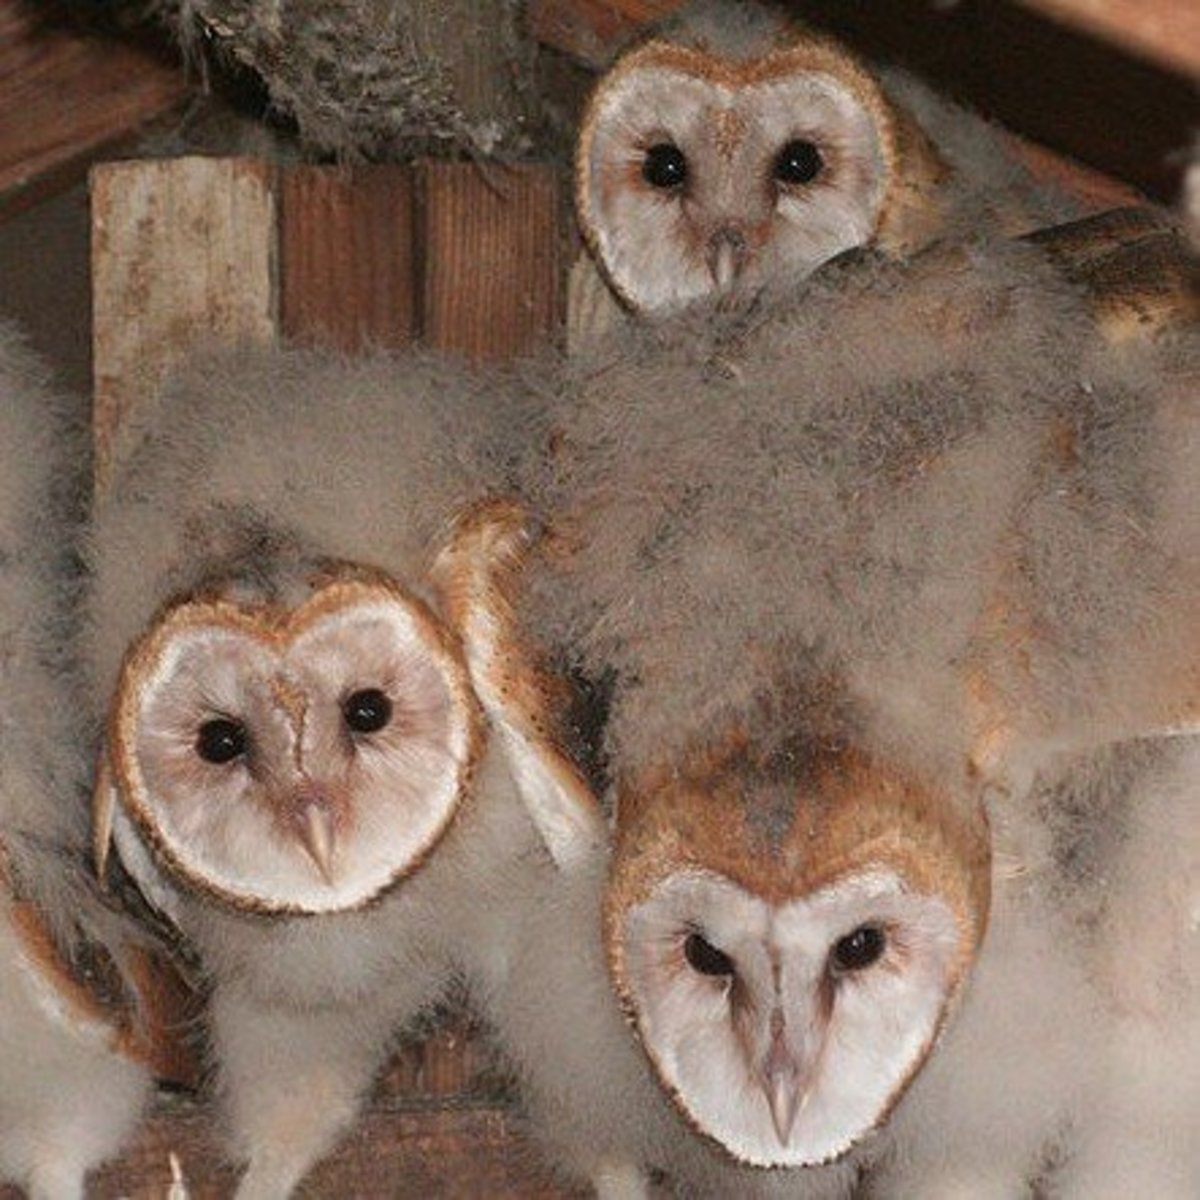 A clutch of little owlets